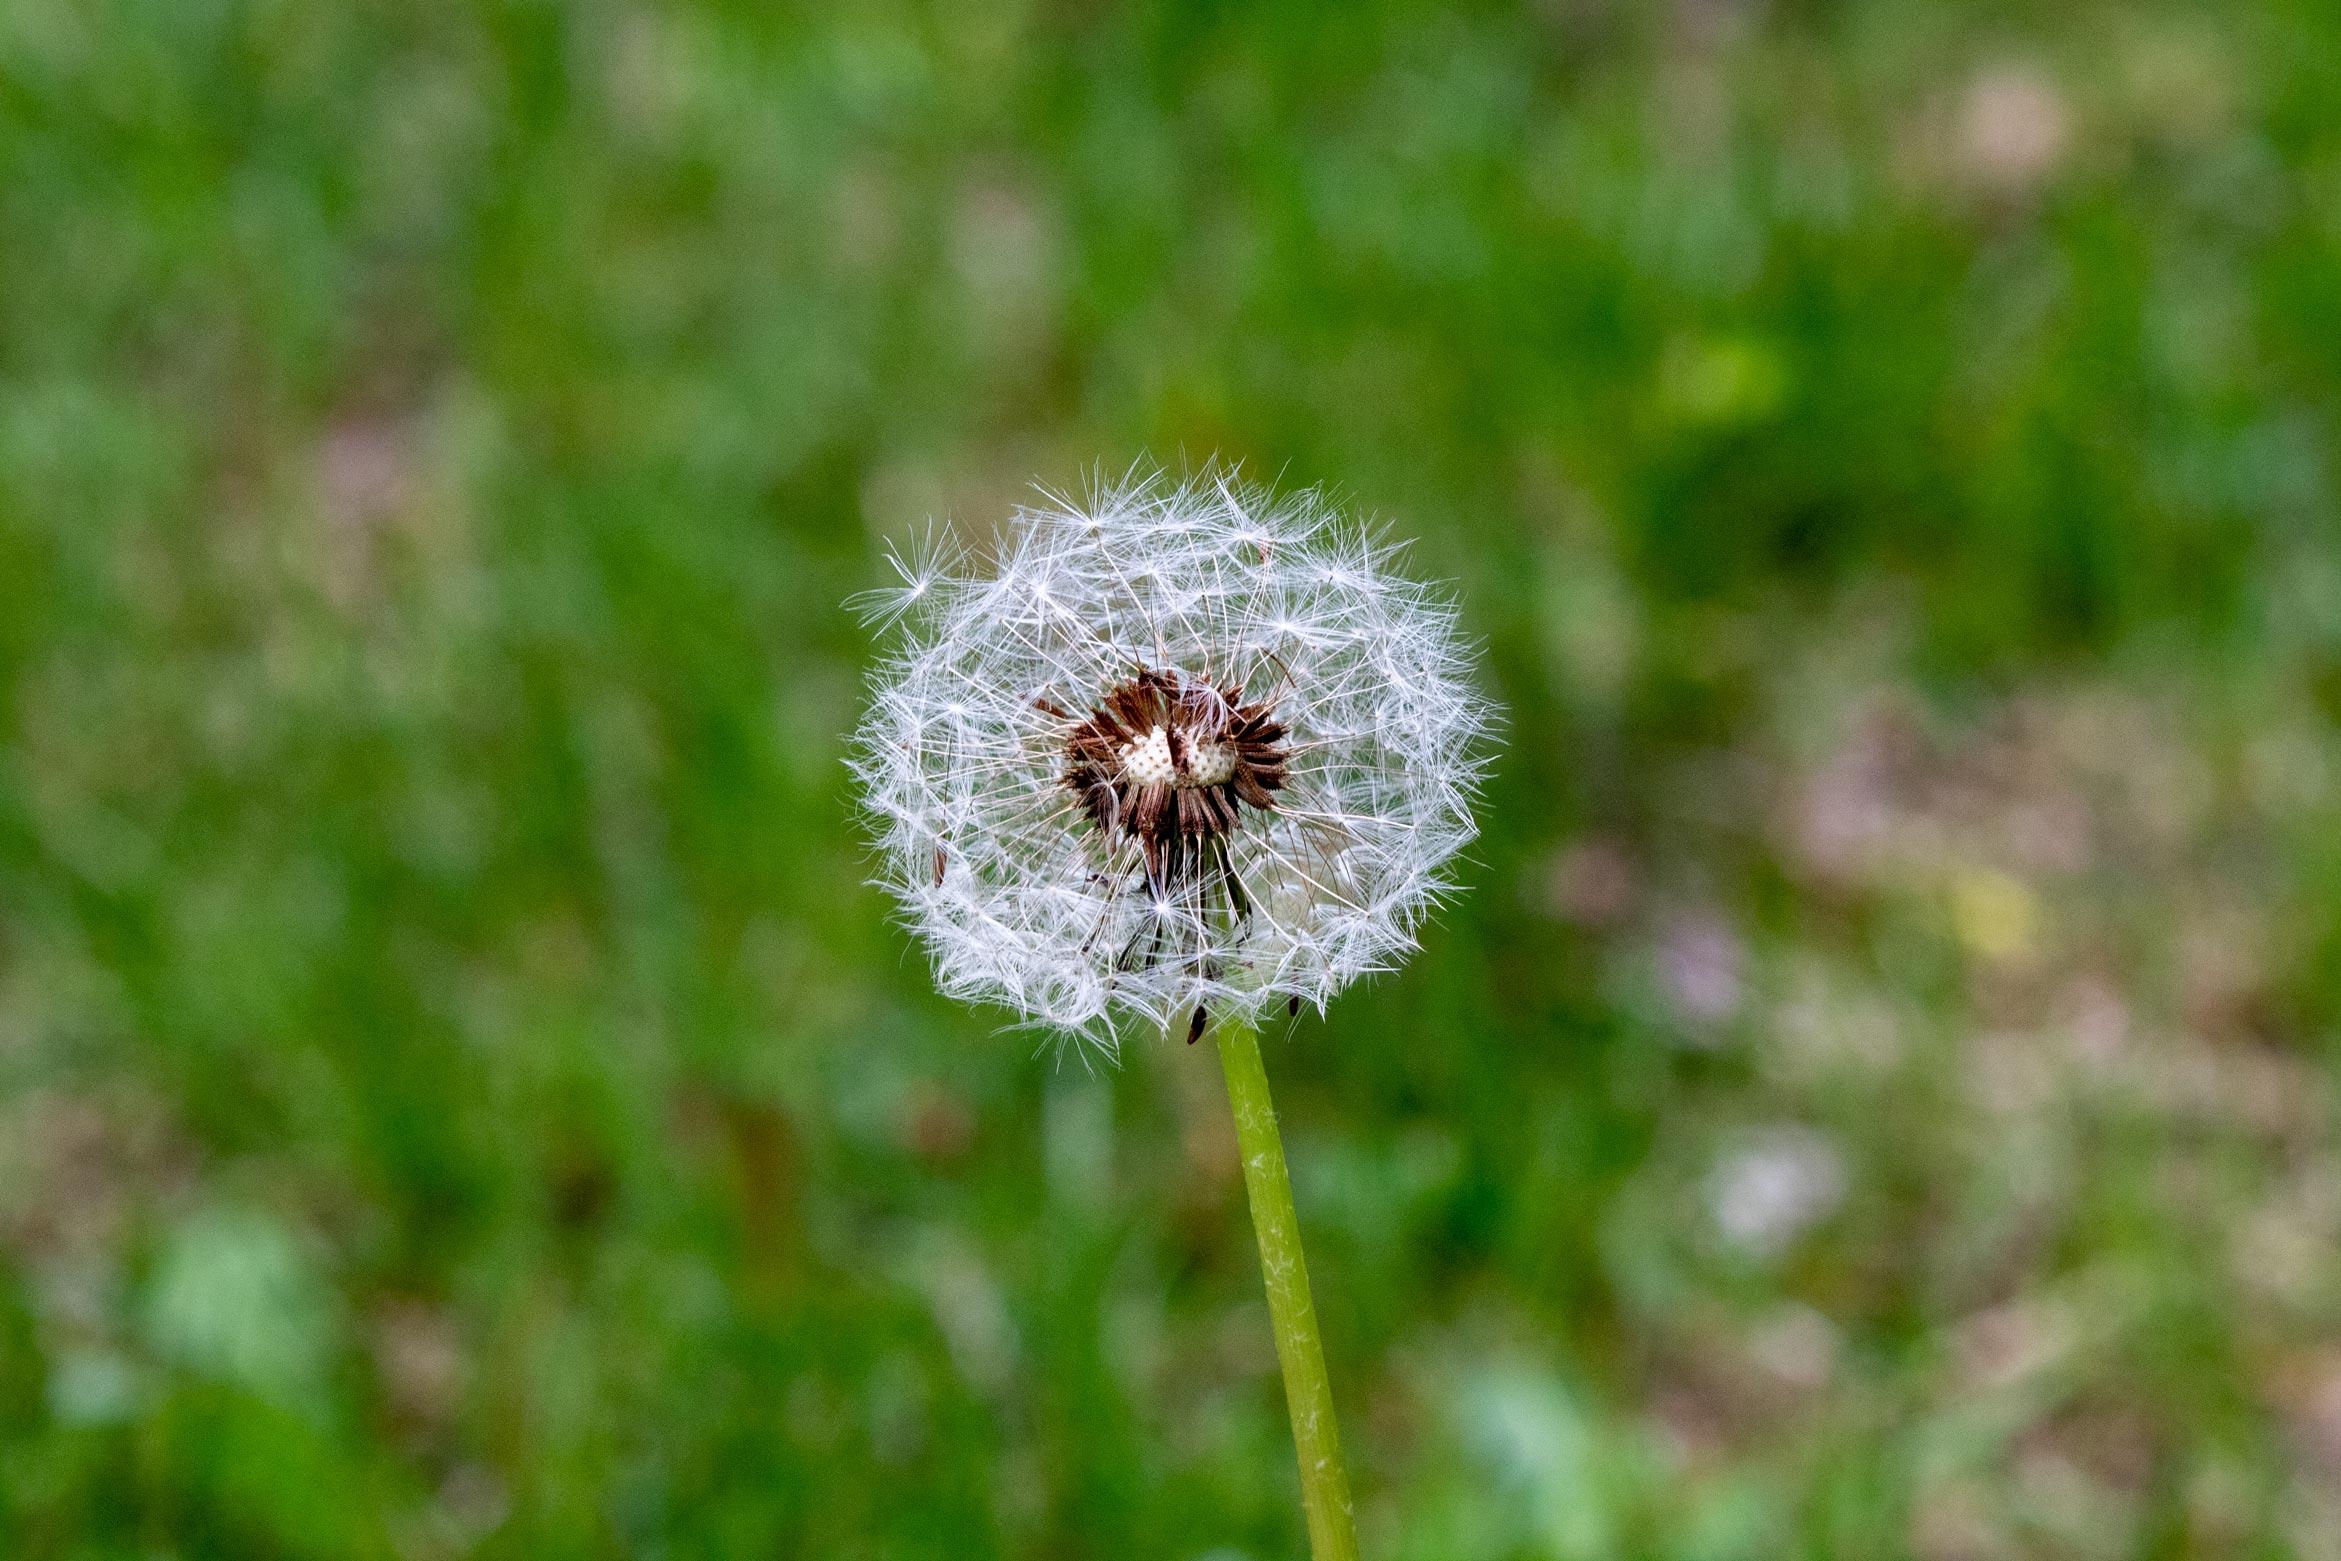 Dandelion covered in white fluff